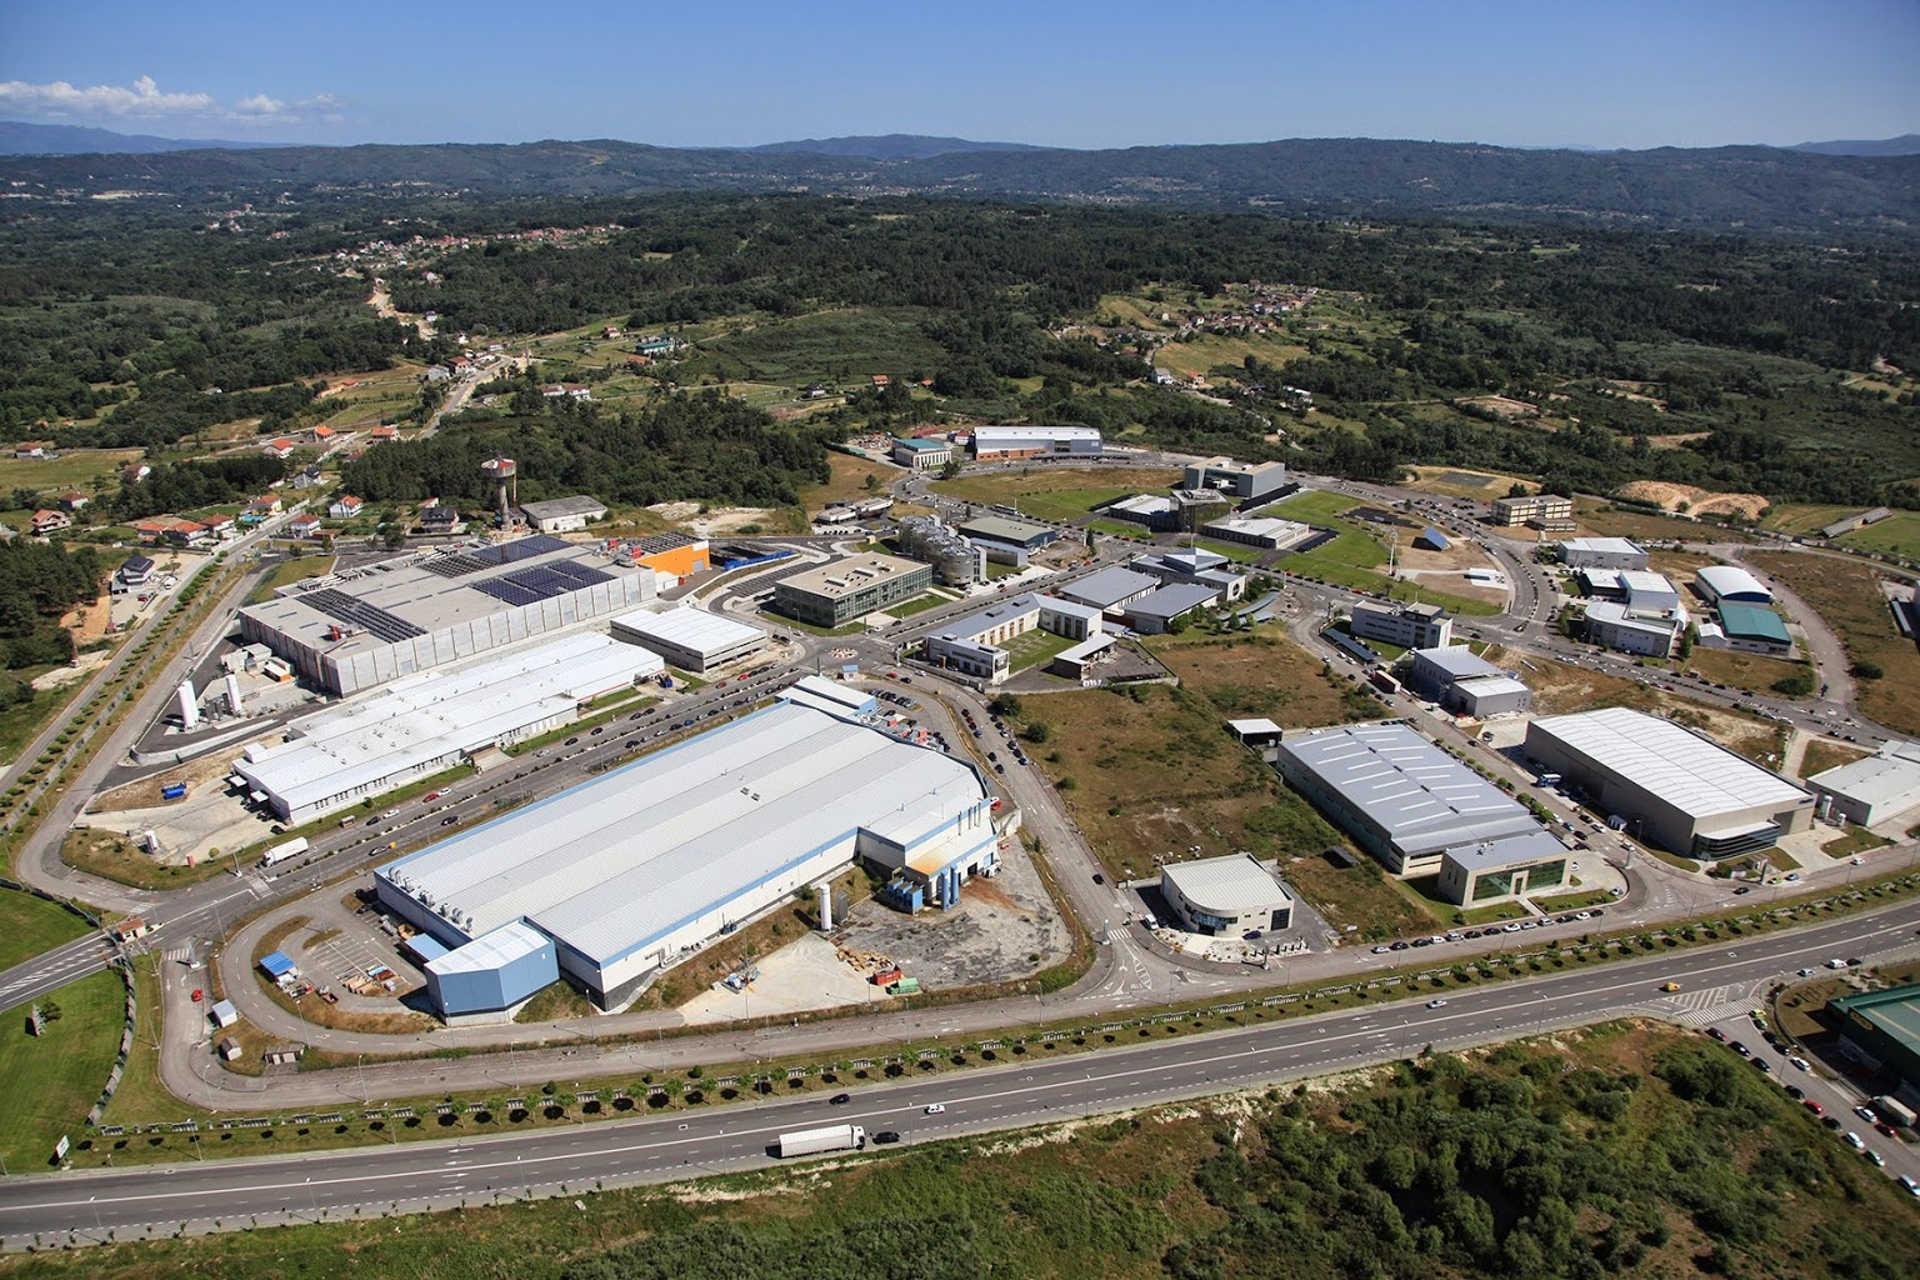 Visita del MIEMA a la empresa COASA en San Cibrao das Viñas (Ourense)